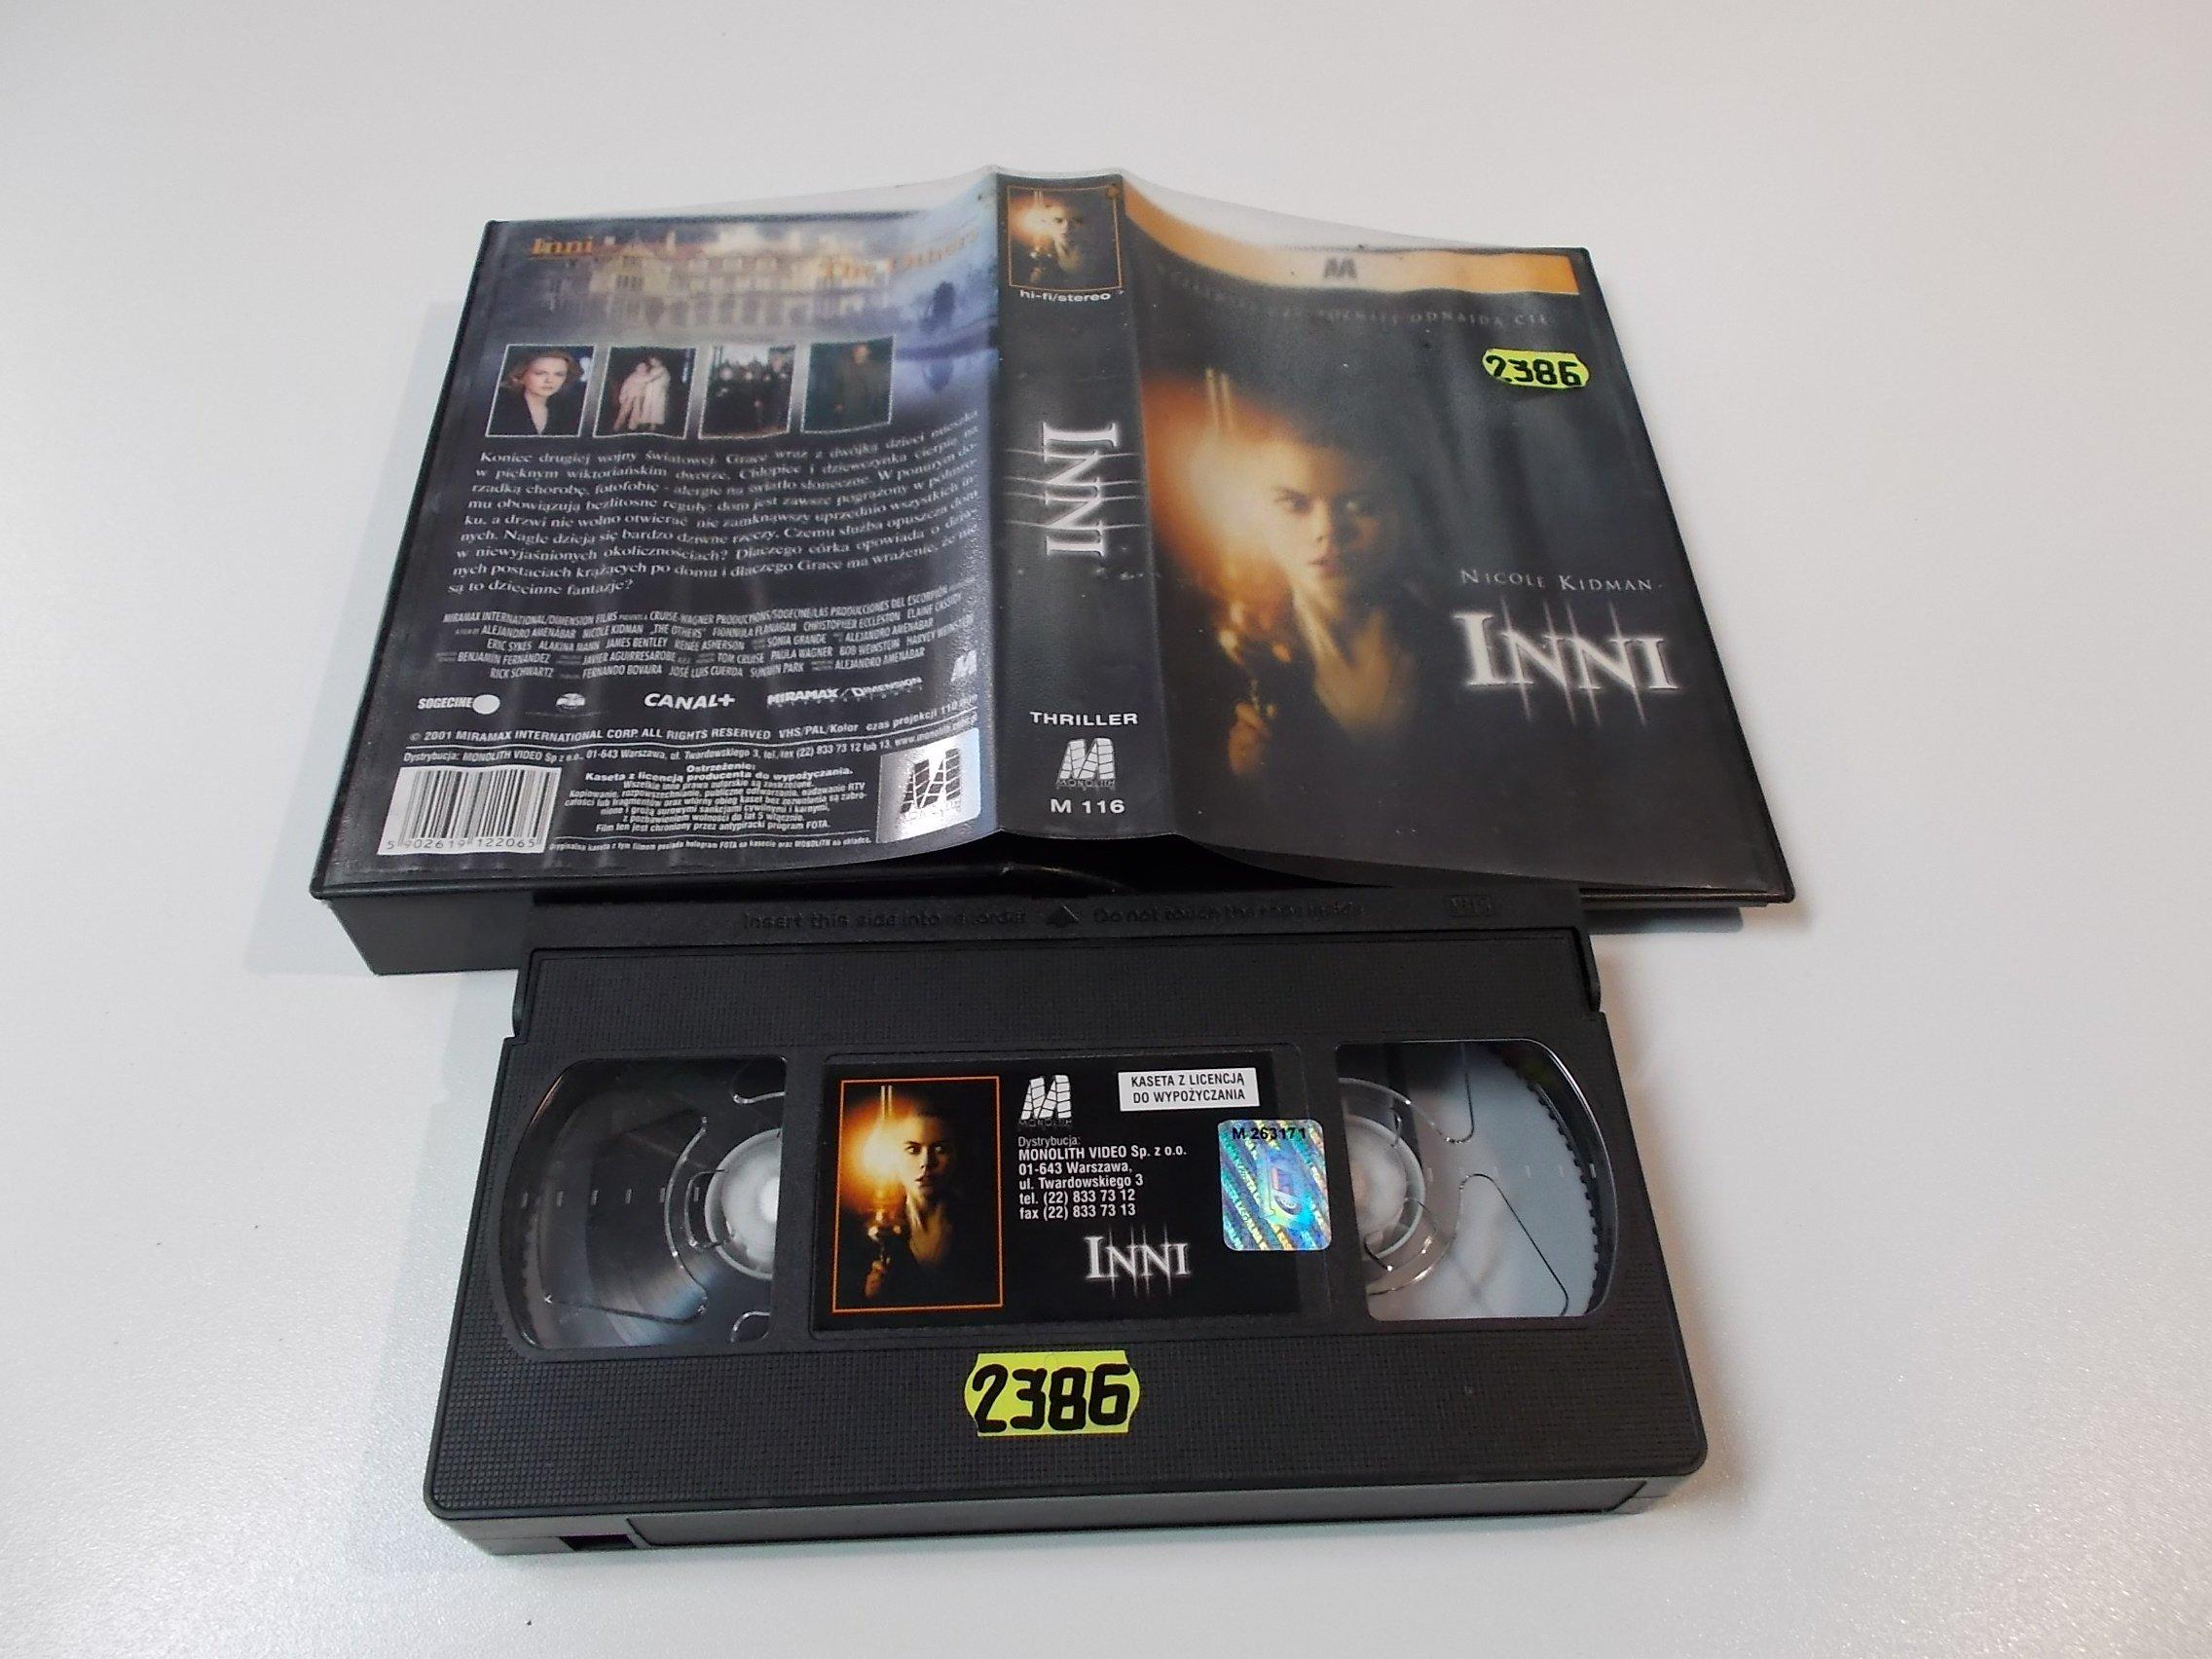 INNI - NICOLE KIDMAN - Kaseta Video VHS - Opole 1520